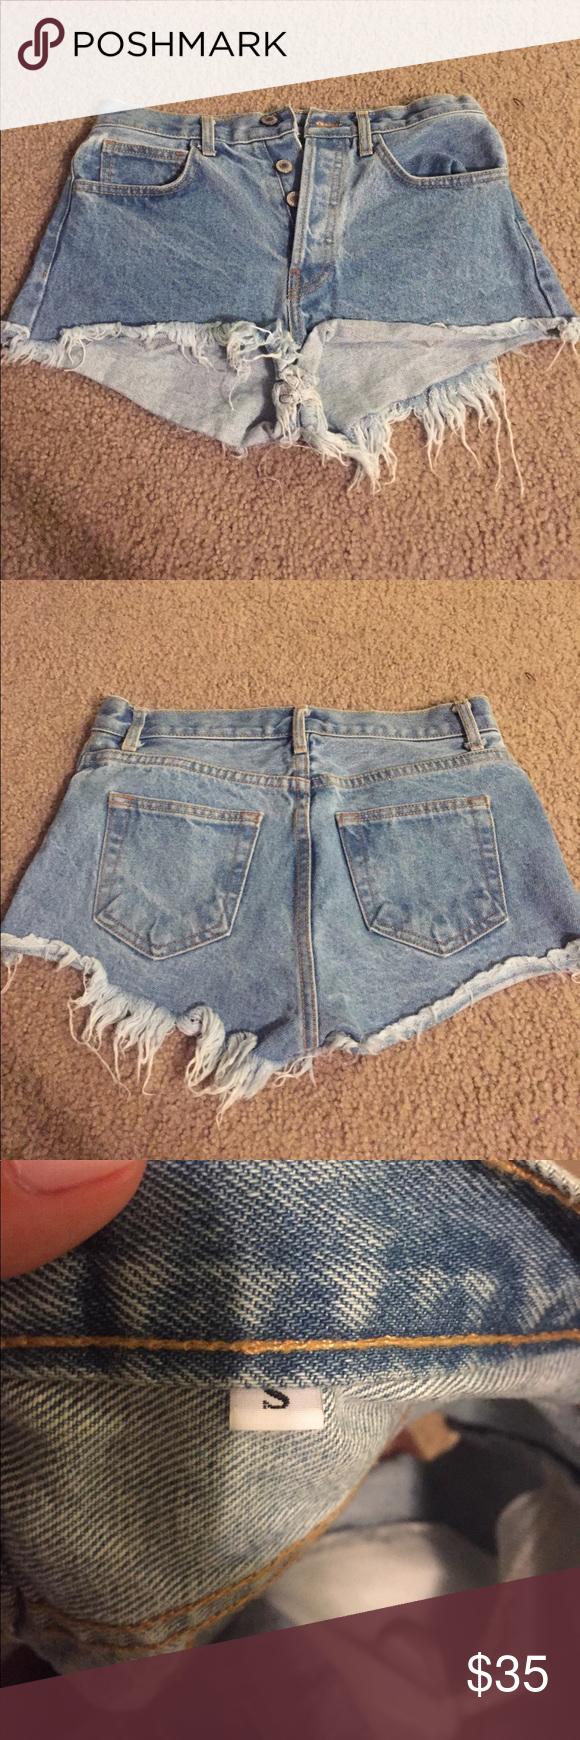 Brandy Melville Jean Shorts Brandy Melville Jean Shorts. Never worn. Brandy Melville Shorts Jean Shorts